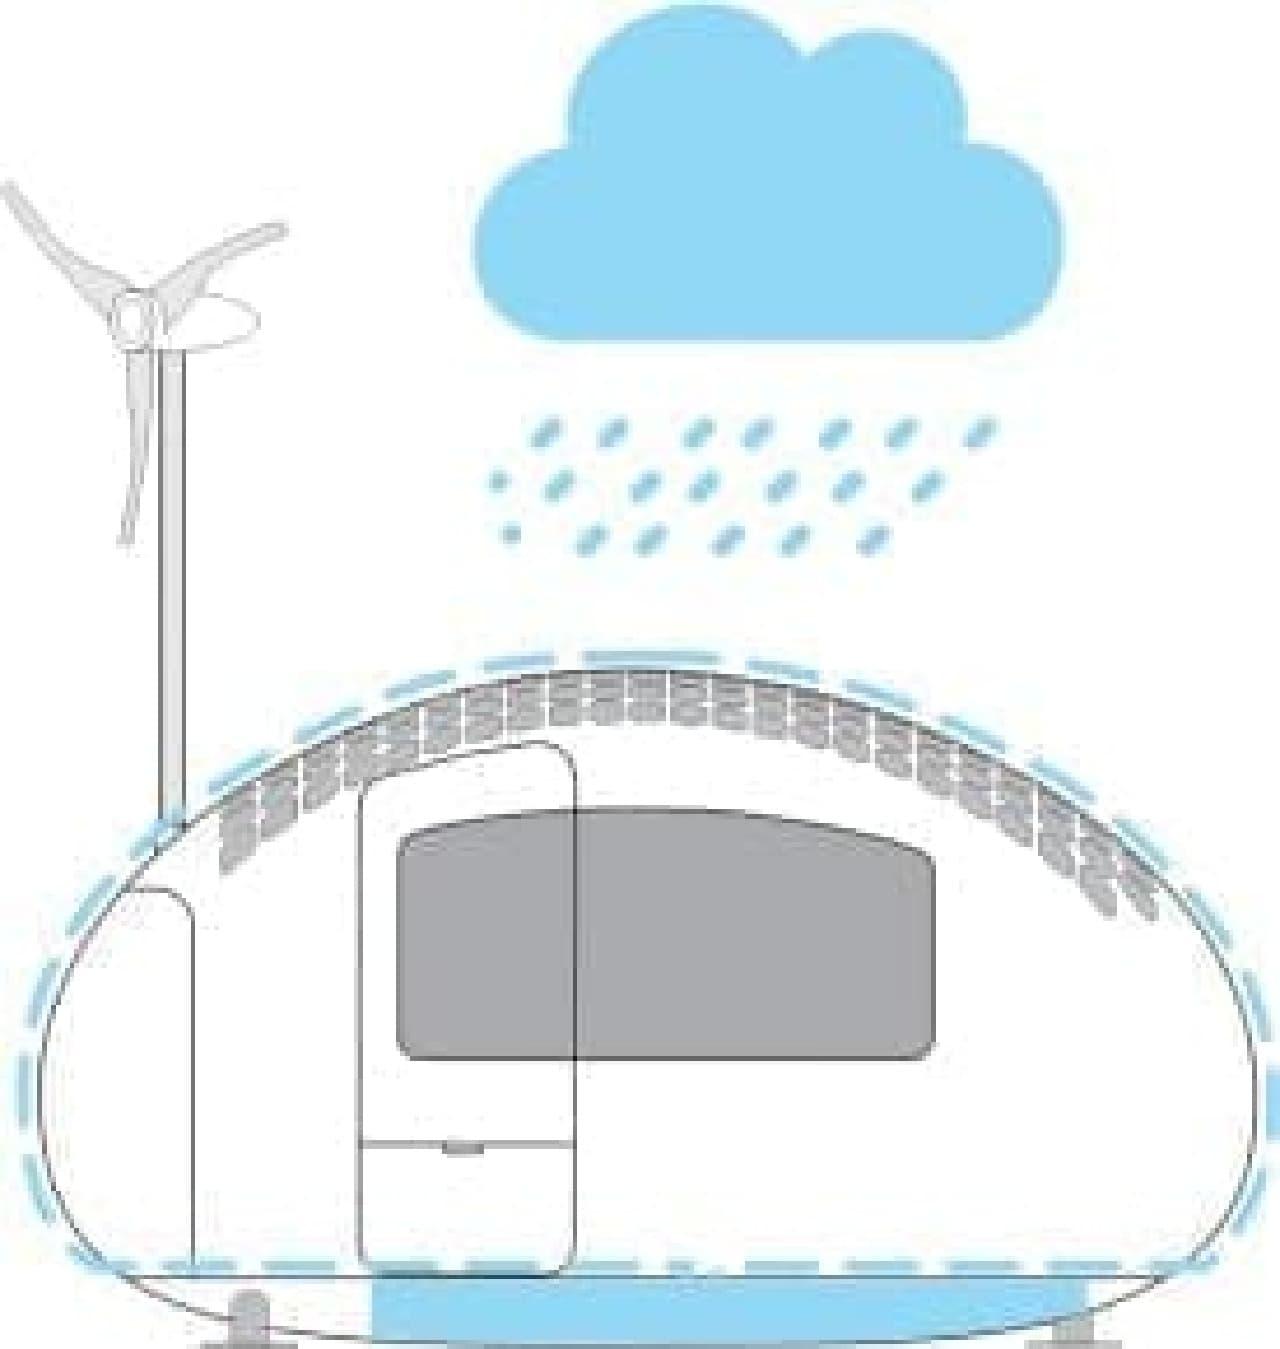 「Ecocapsule」が雨水を集め、ろ過する仕組み